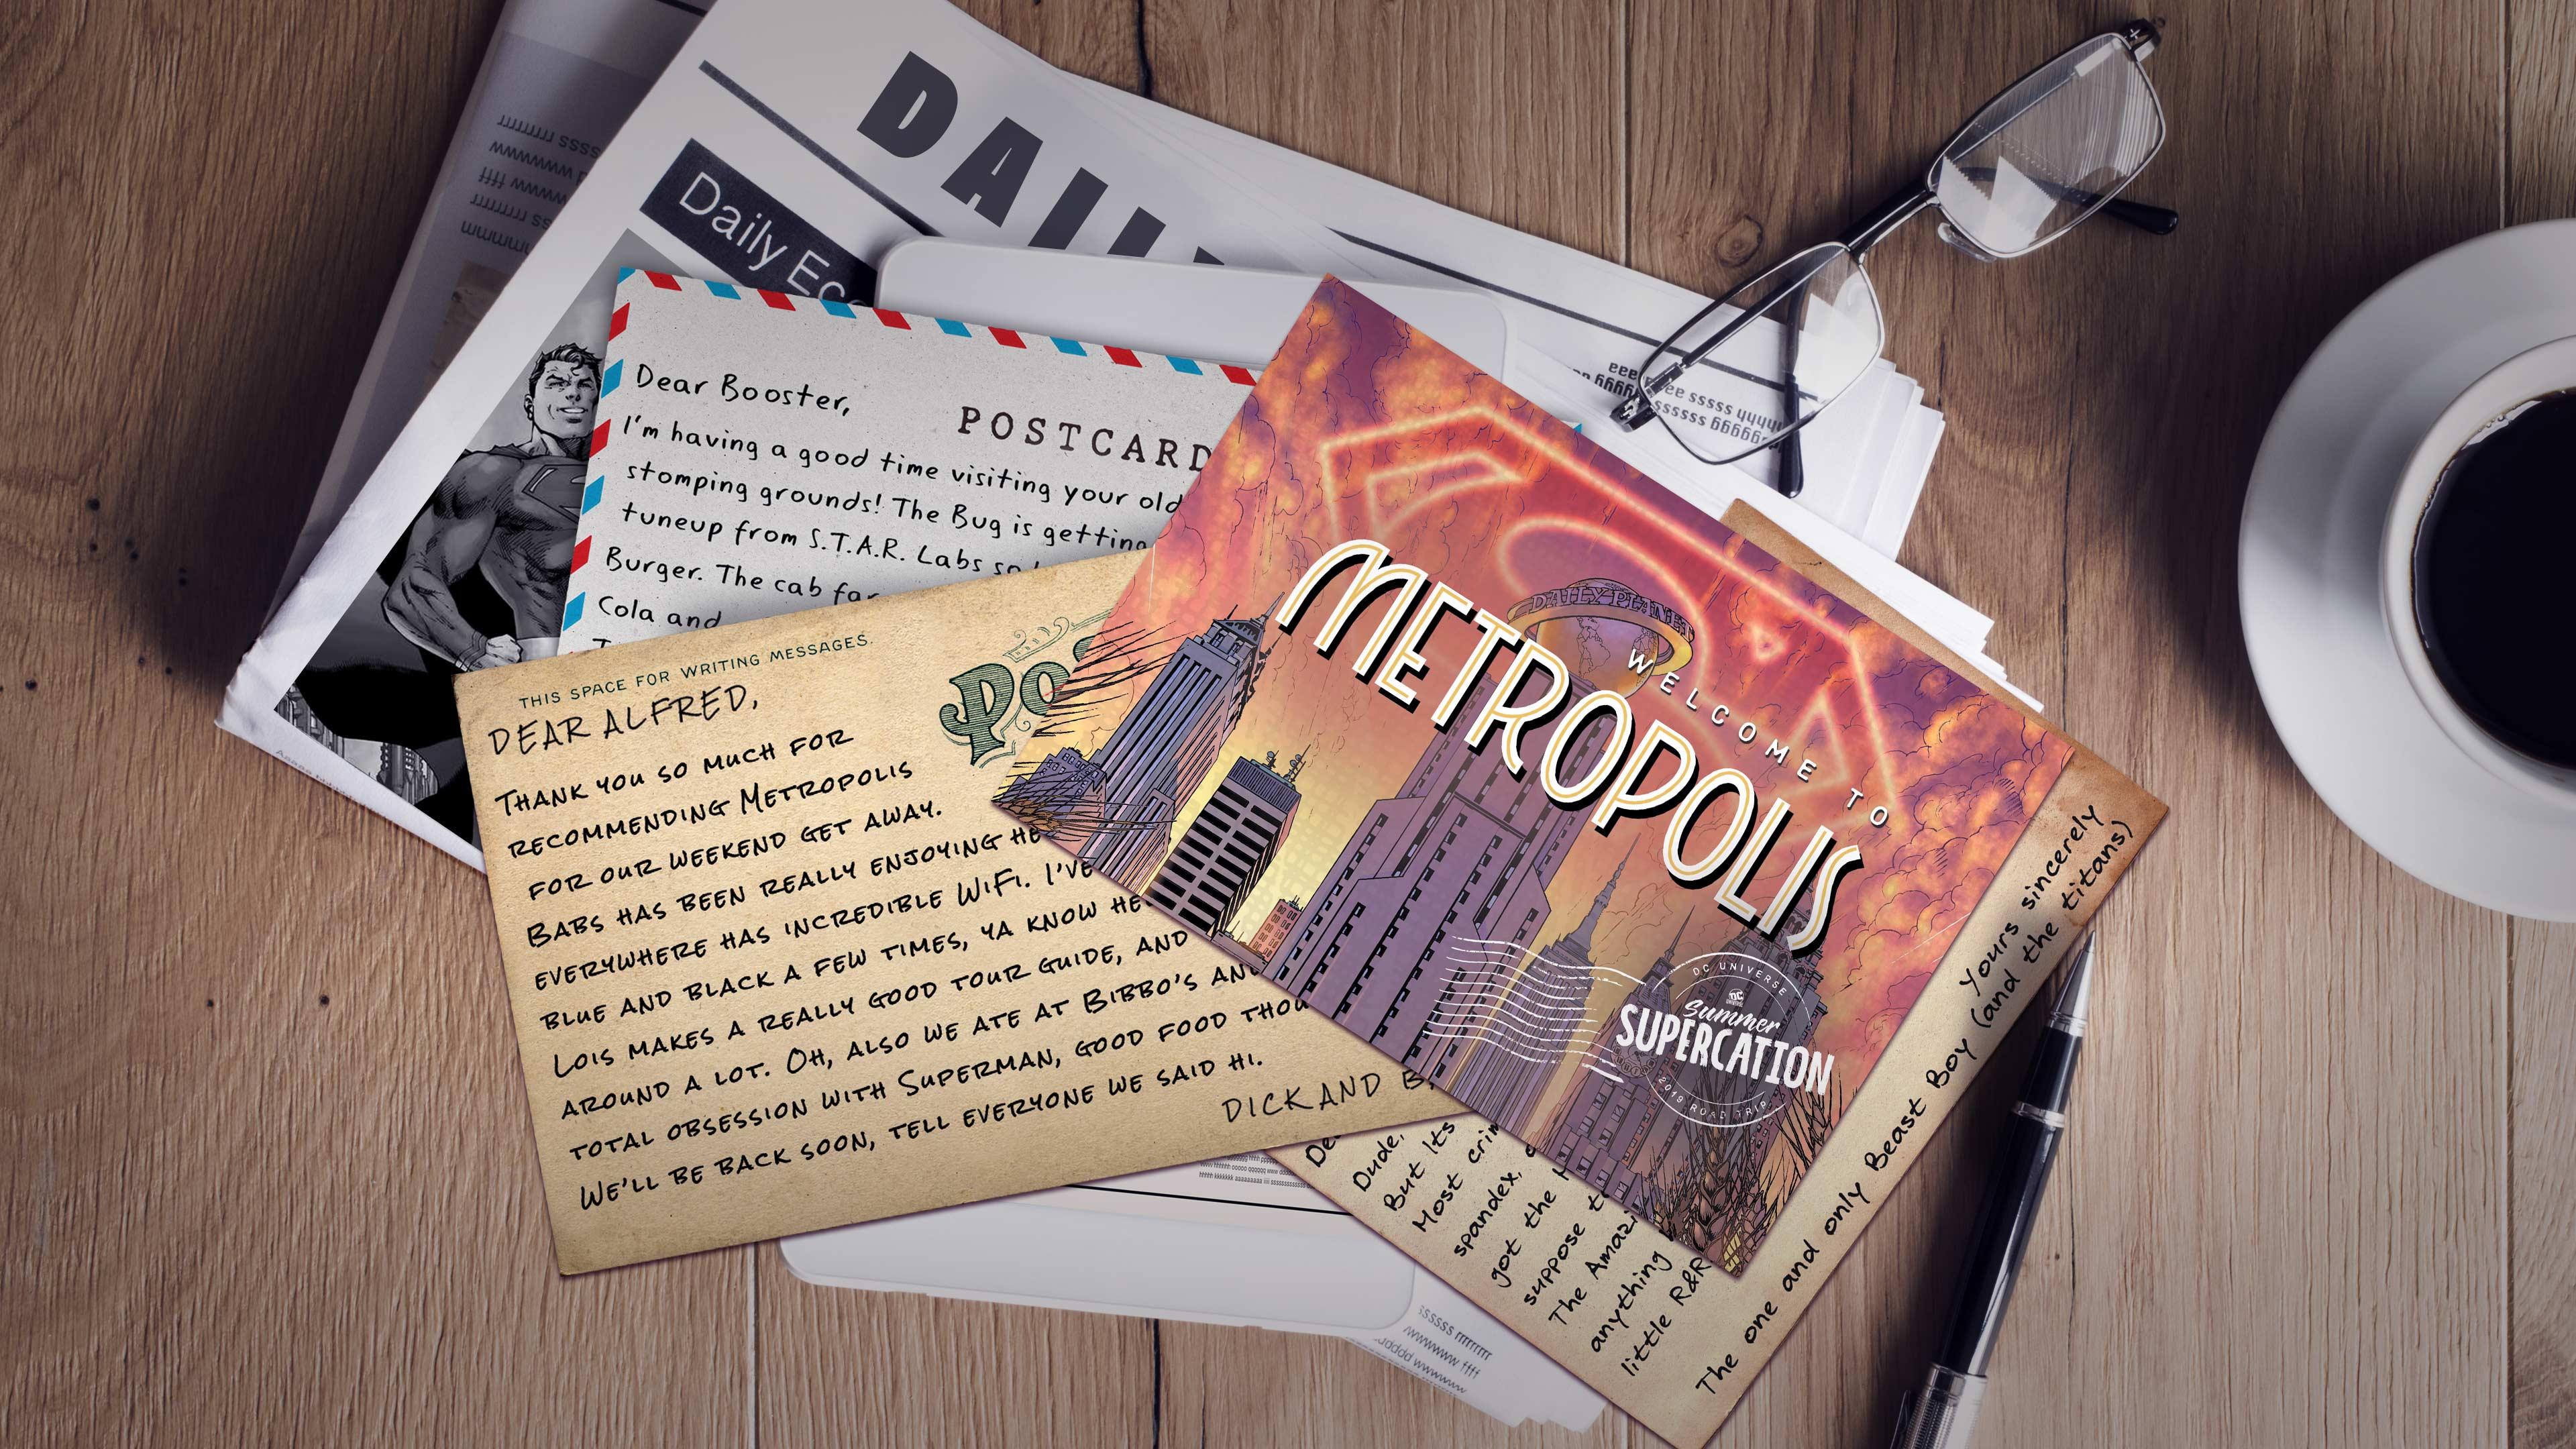 metropolis_postcards_news_mh_190624_v1.jpg